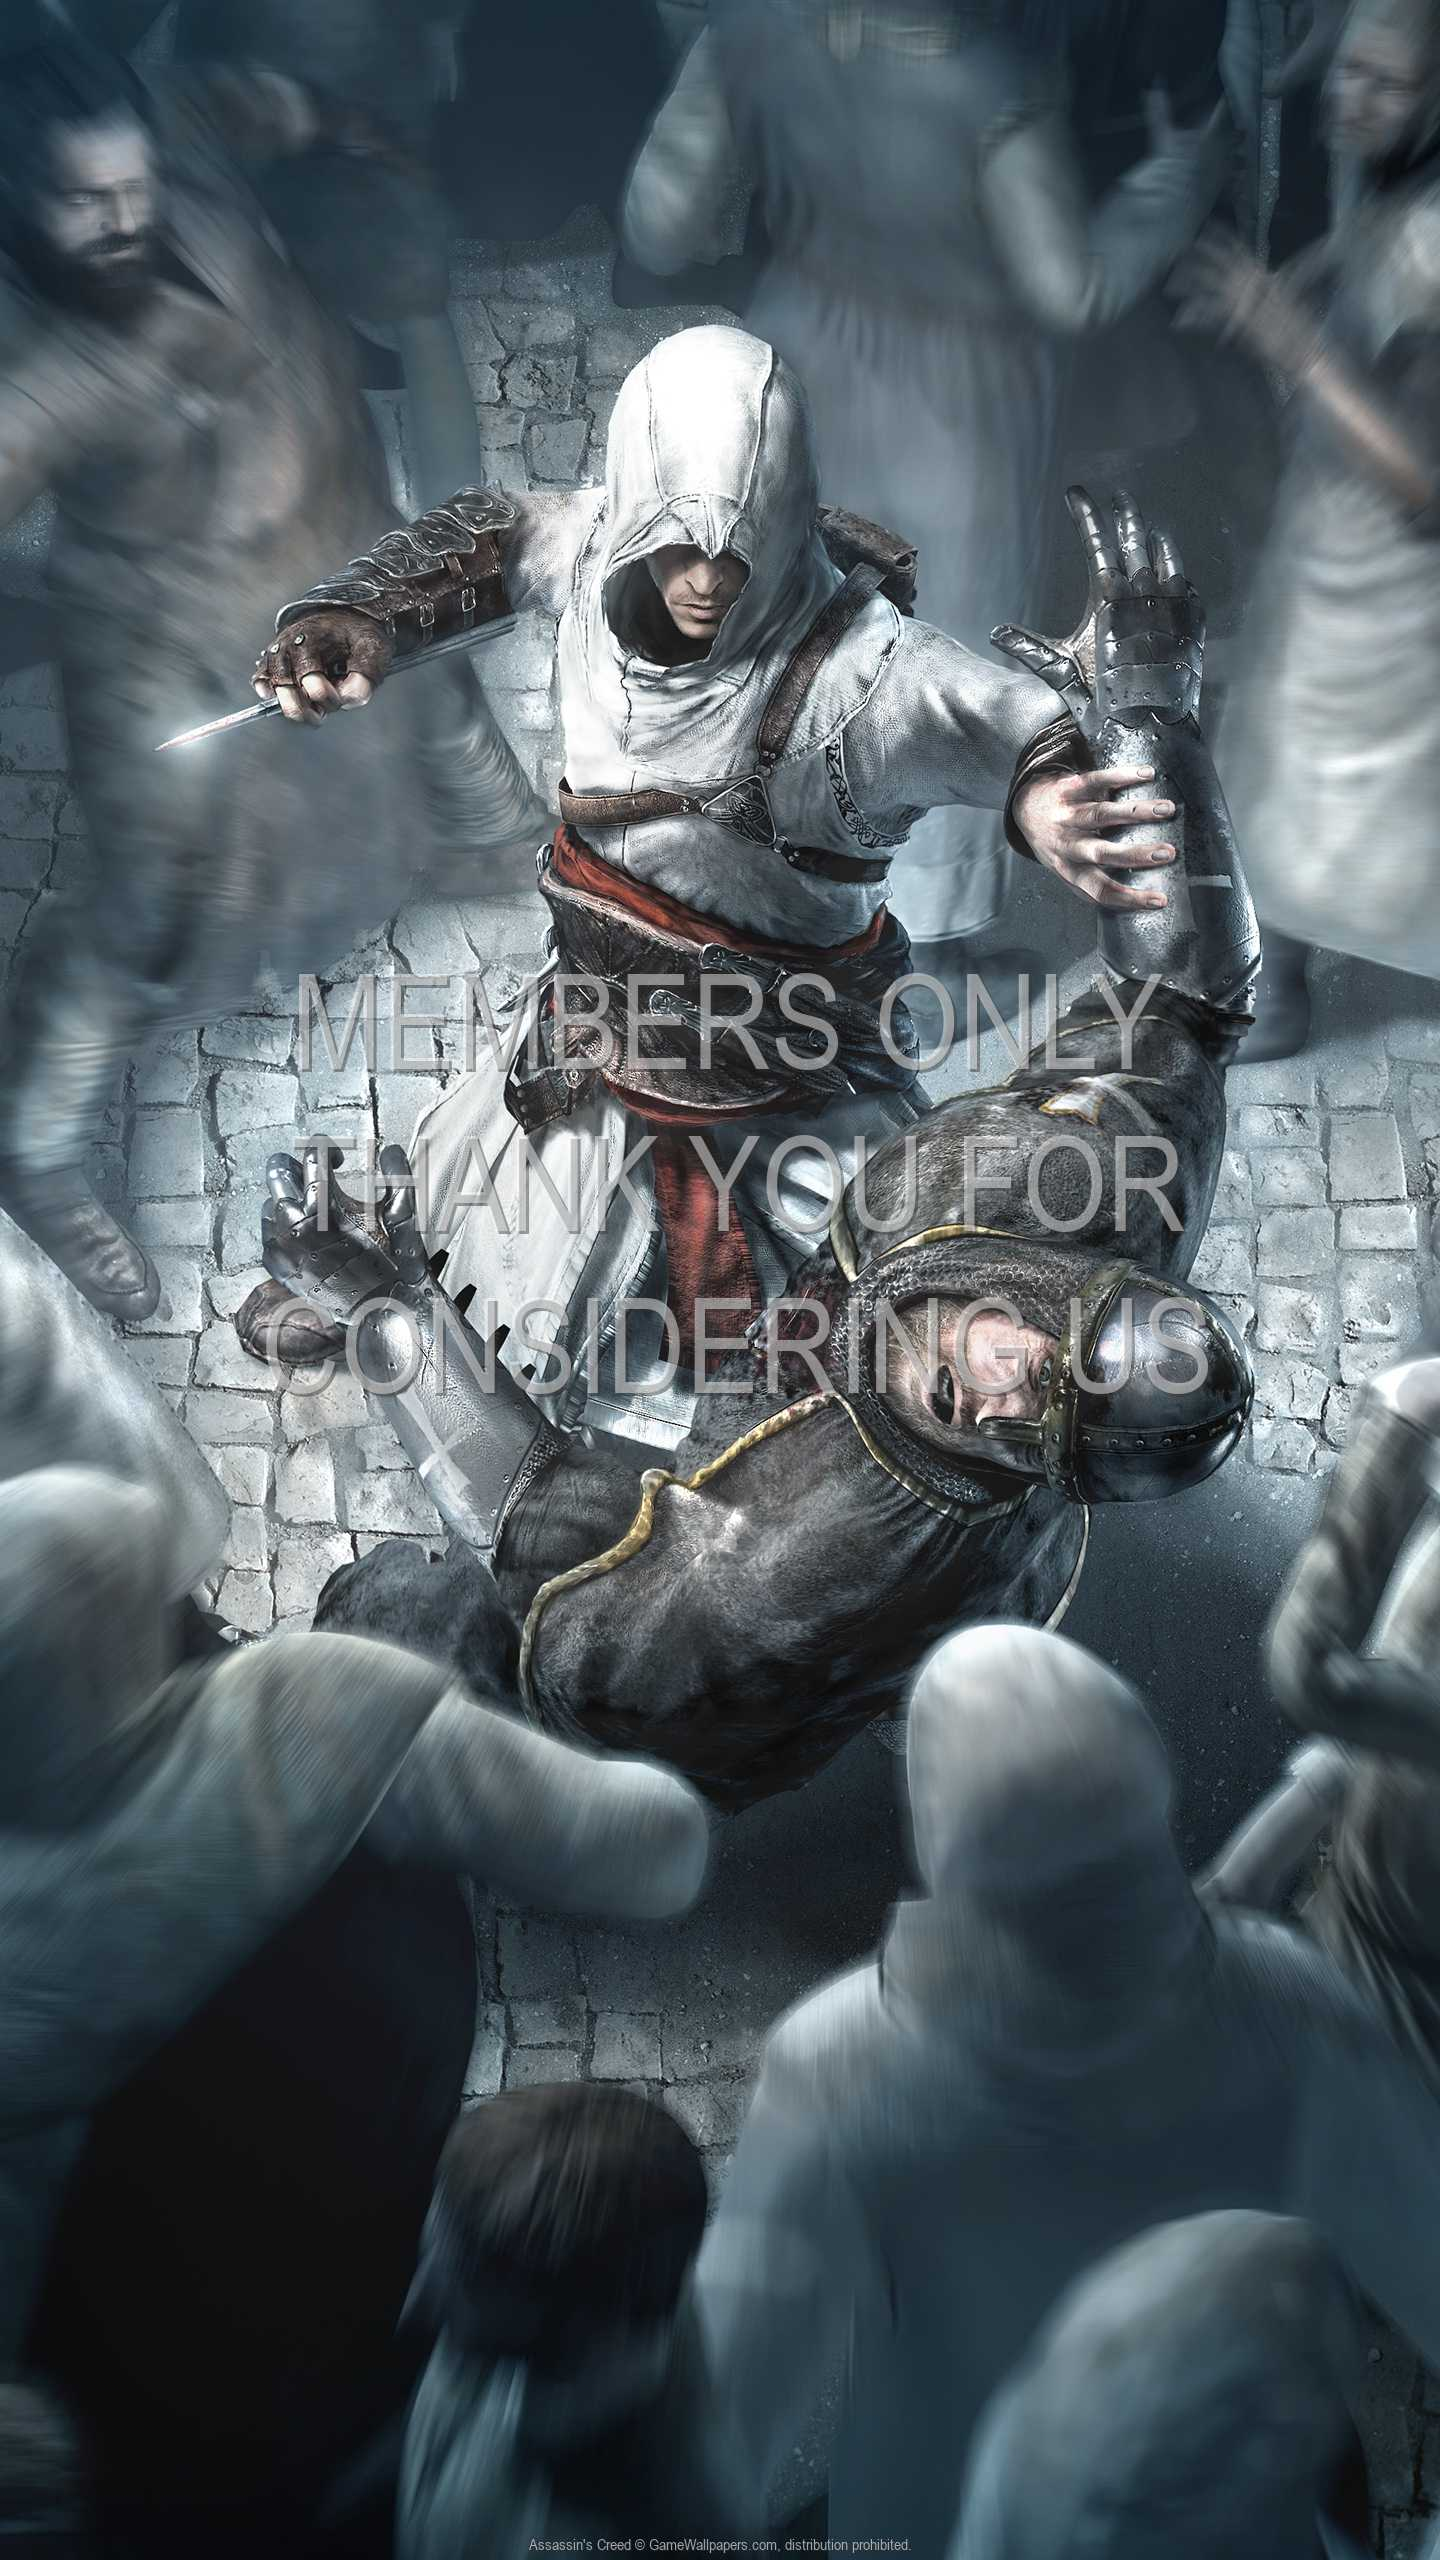 Assassin's Creed 1440p Vertical Handy Hintergrundbild 15